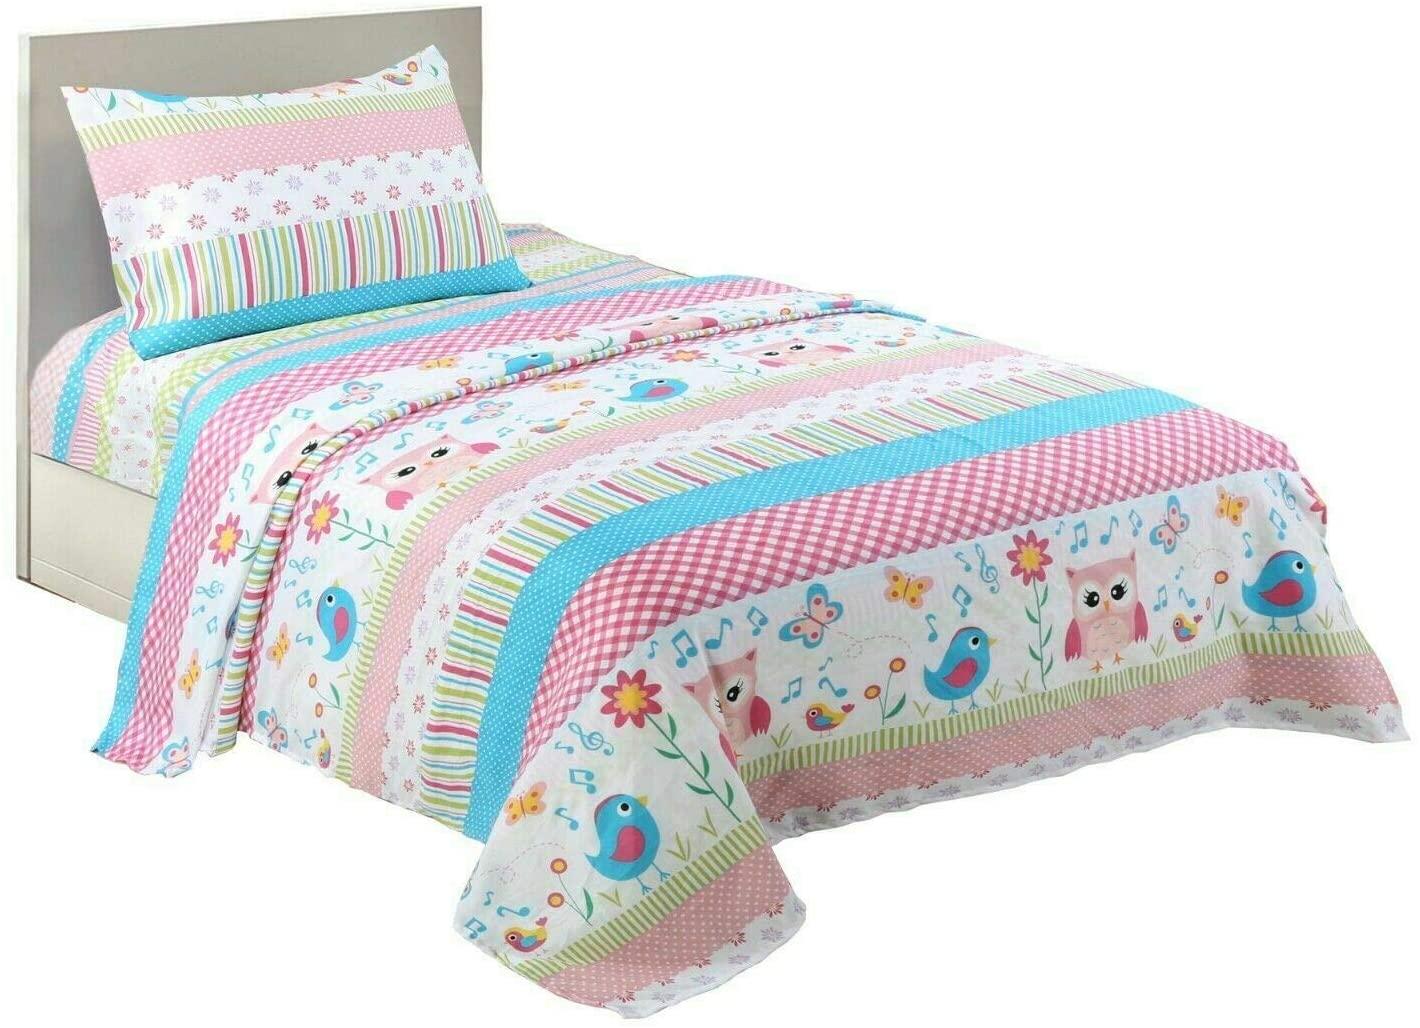 MarCielo Bed Sheets for Kids Twin Sheets for Kids Girls Boys Teens Children Sheets Soft Fitted Flat Printed Sheet Pillowcase Kids Bedding Bunk Beds Set Bird Garden A73 (Twin)